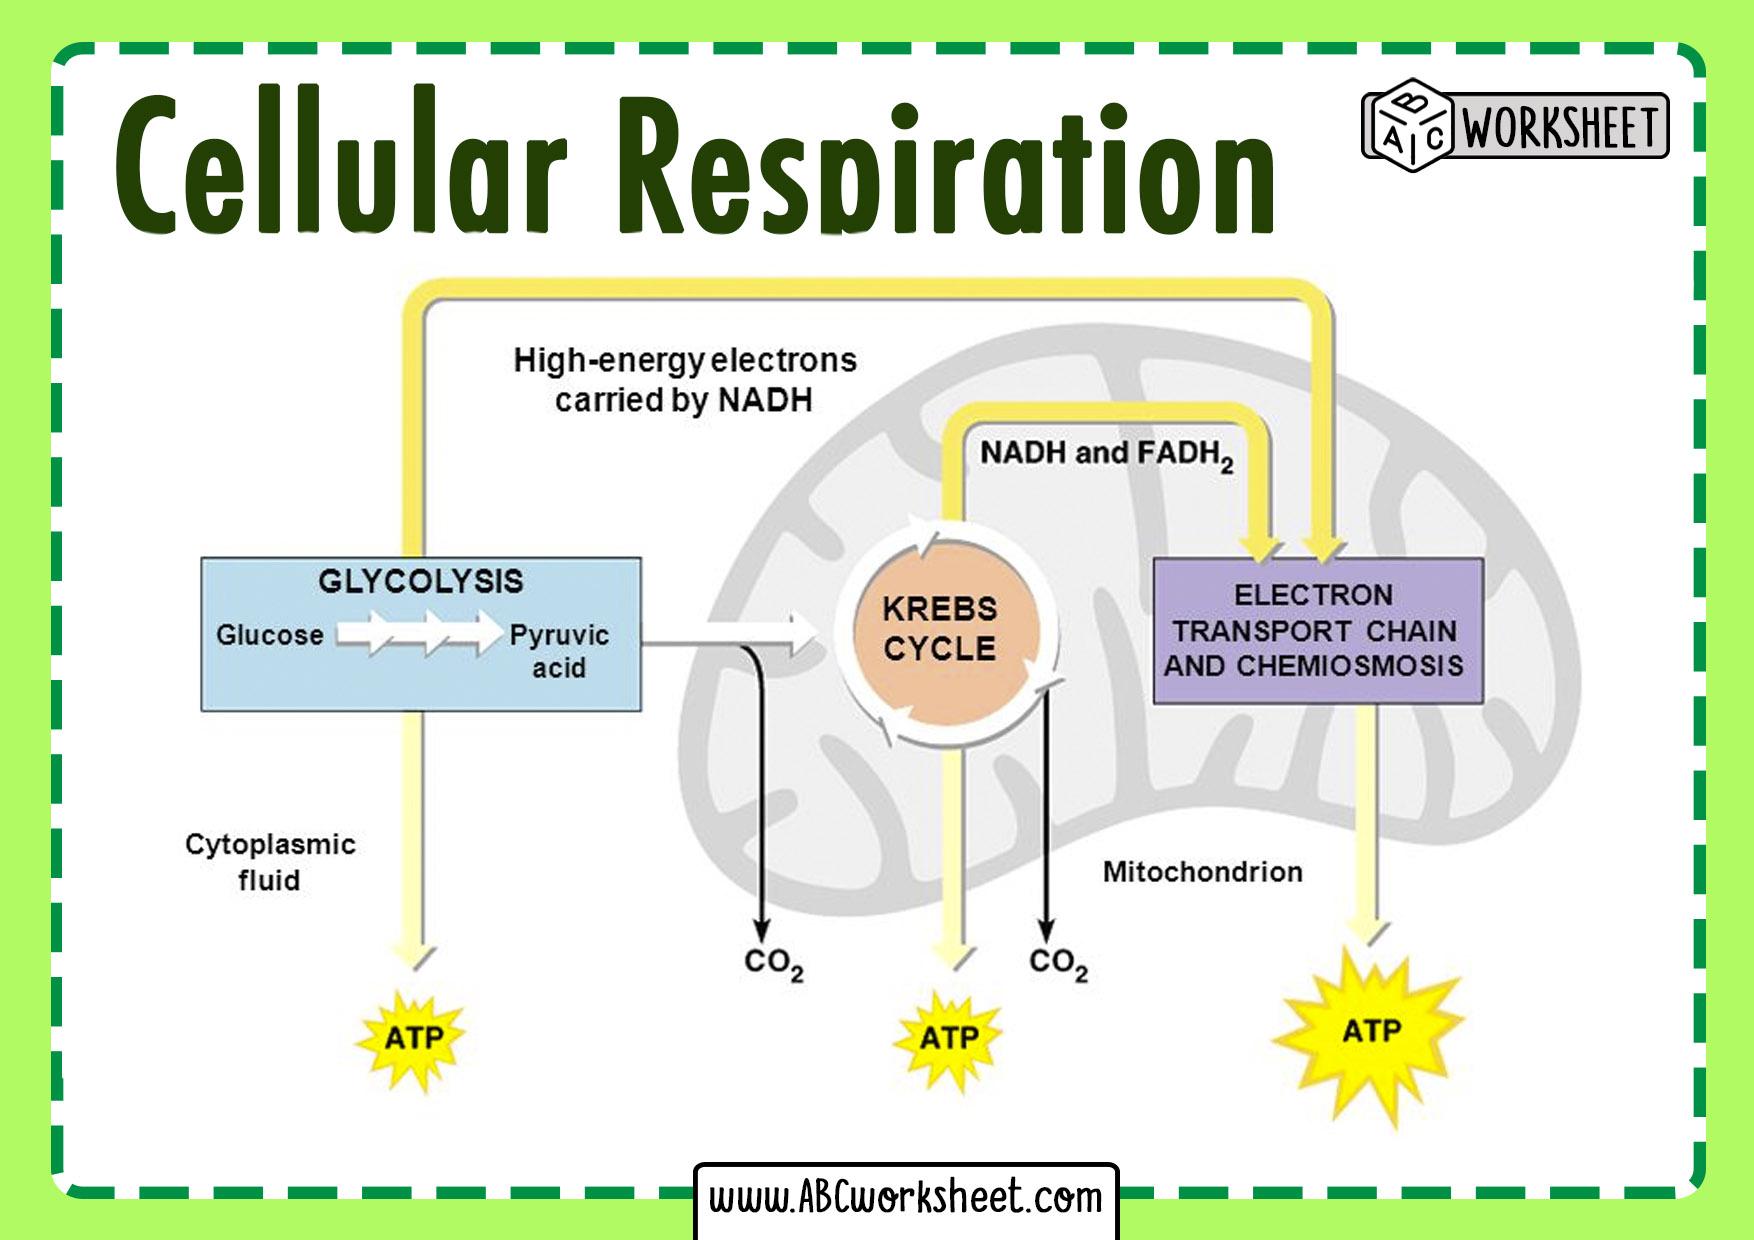 Cellular Respiration Cycle